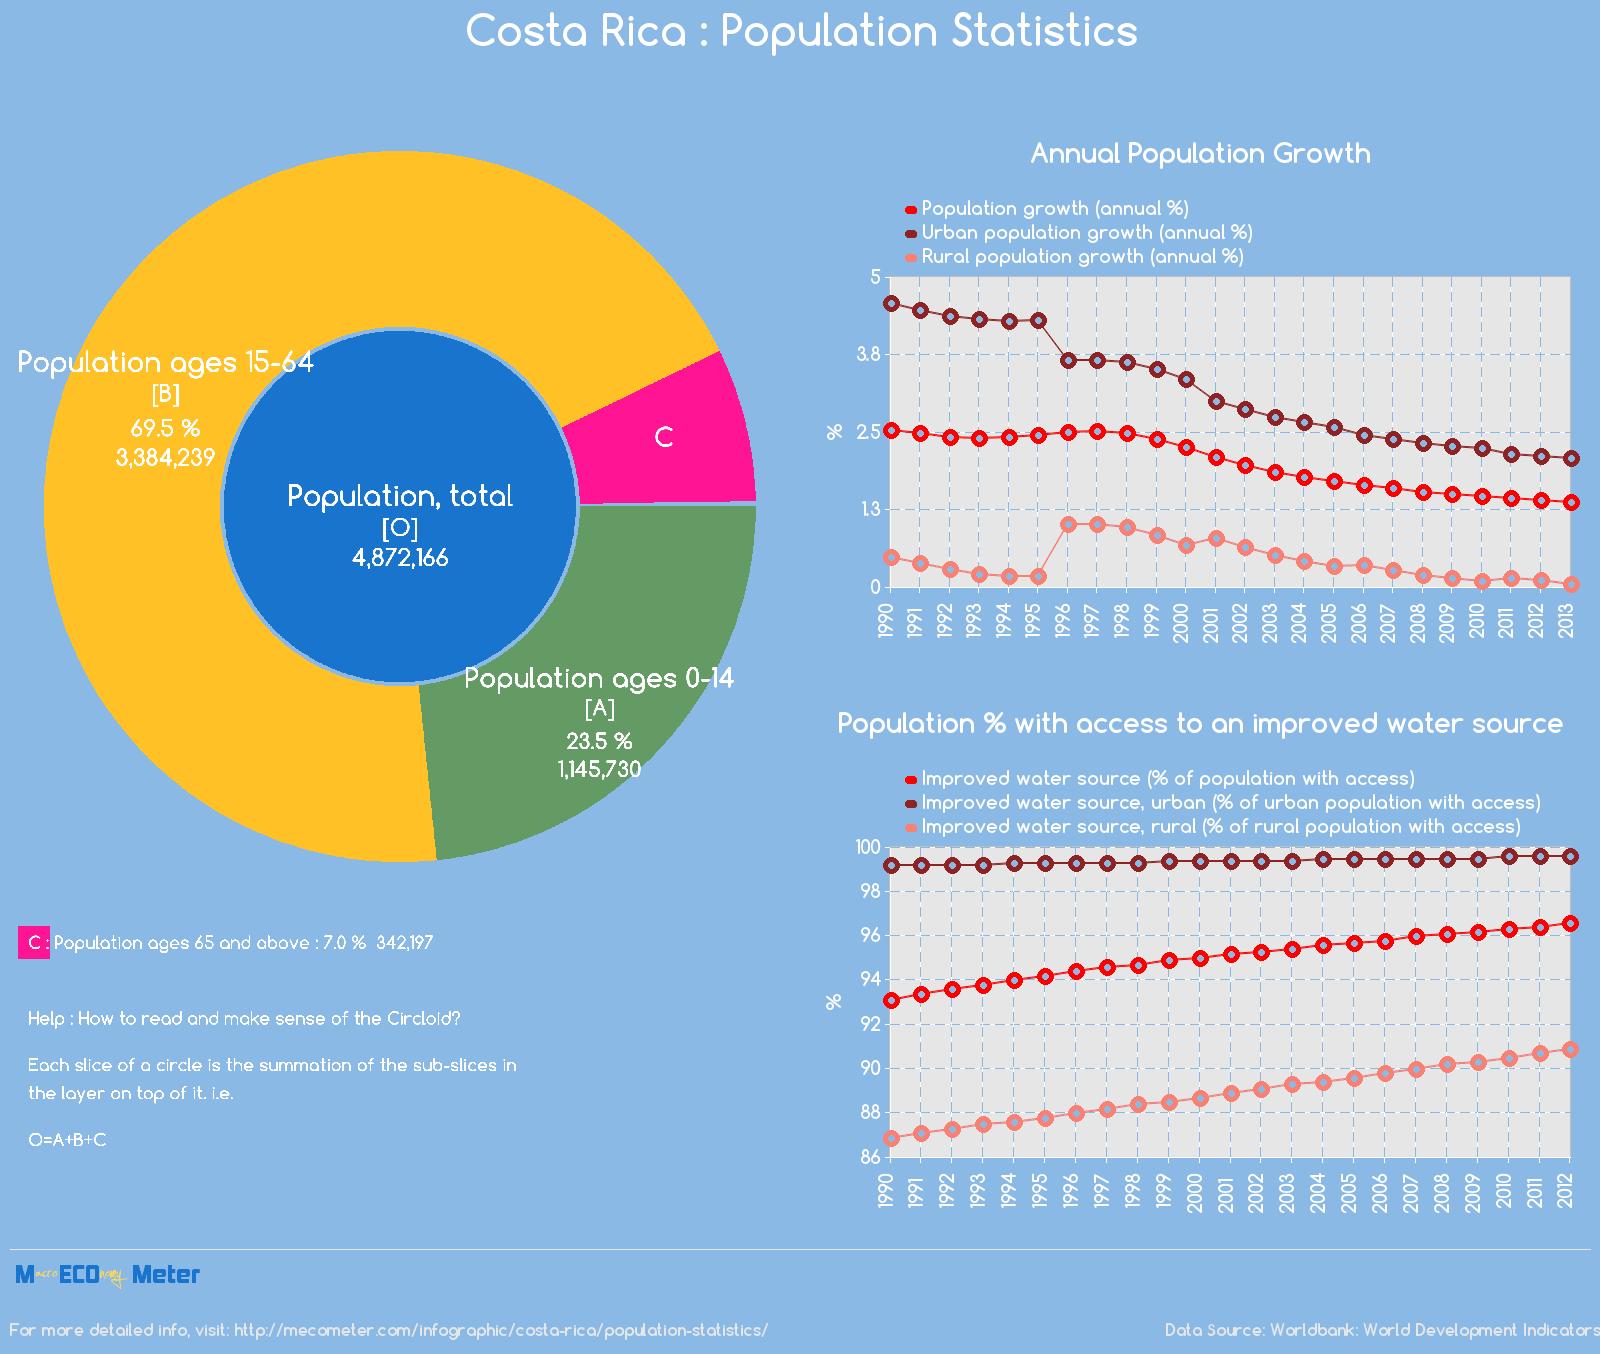 Costa Rica : Population Statistics